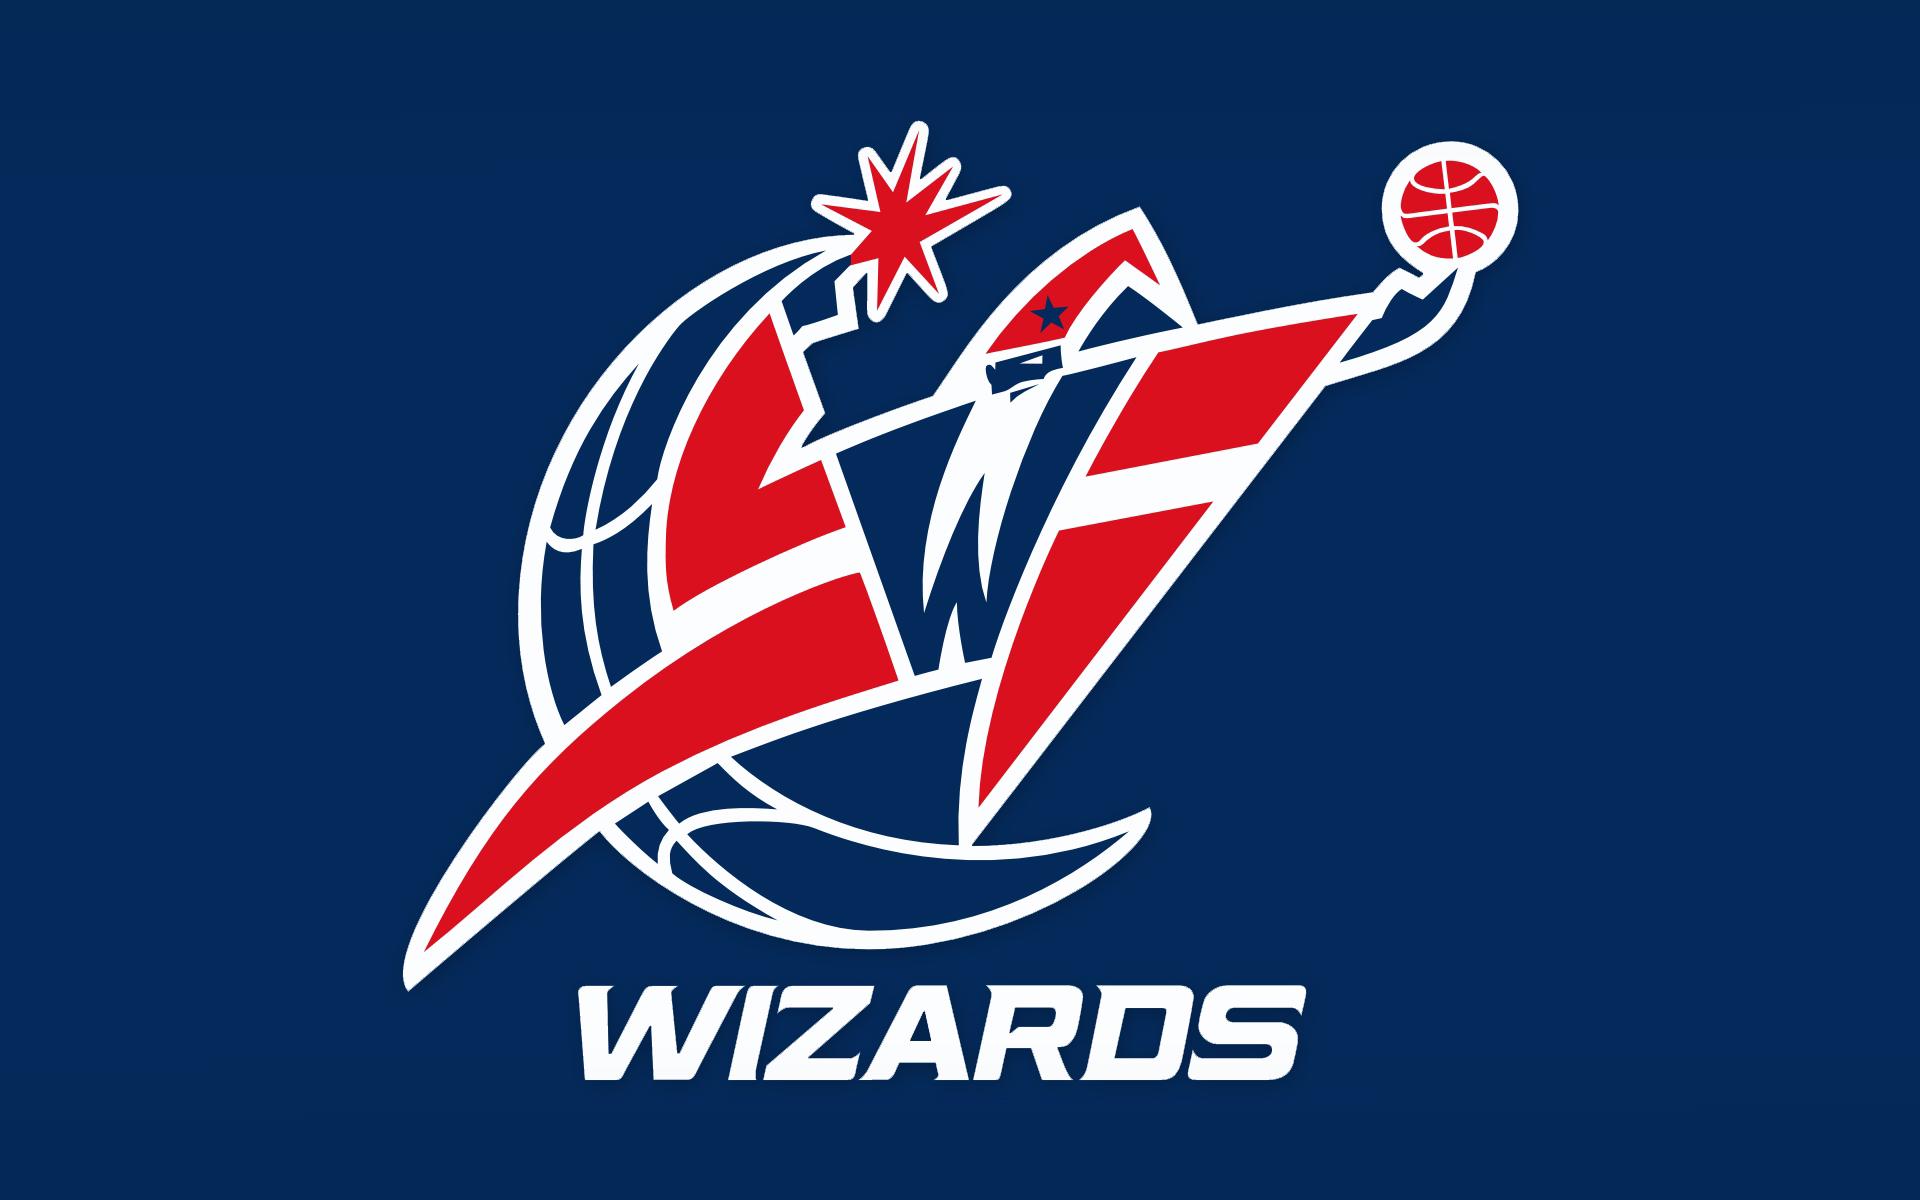 Washington Wizards Viewing Party, Washington Wizards Watch Party